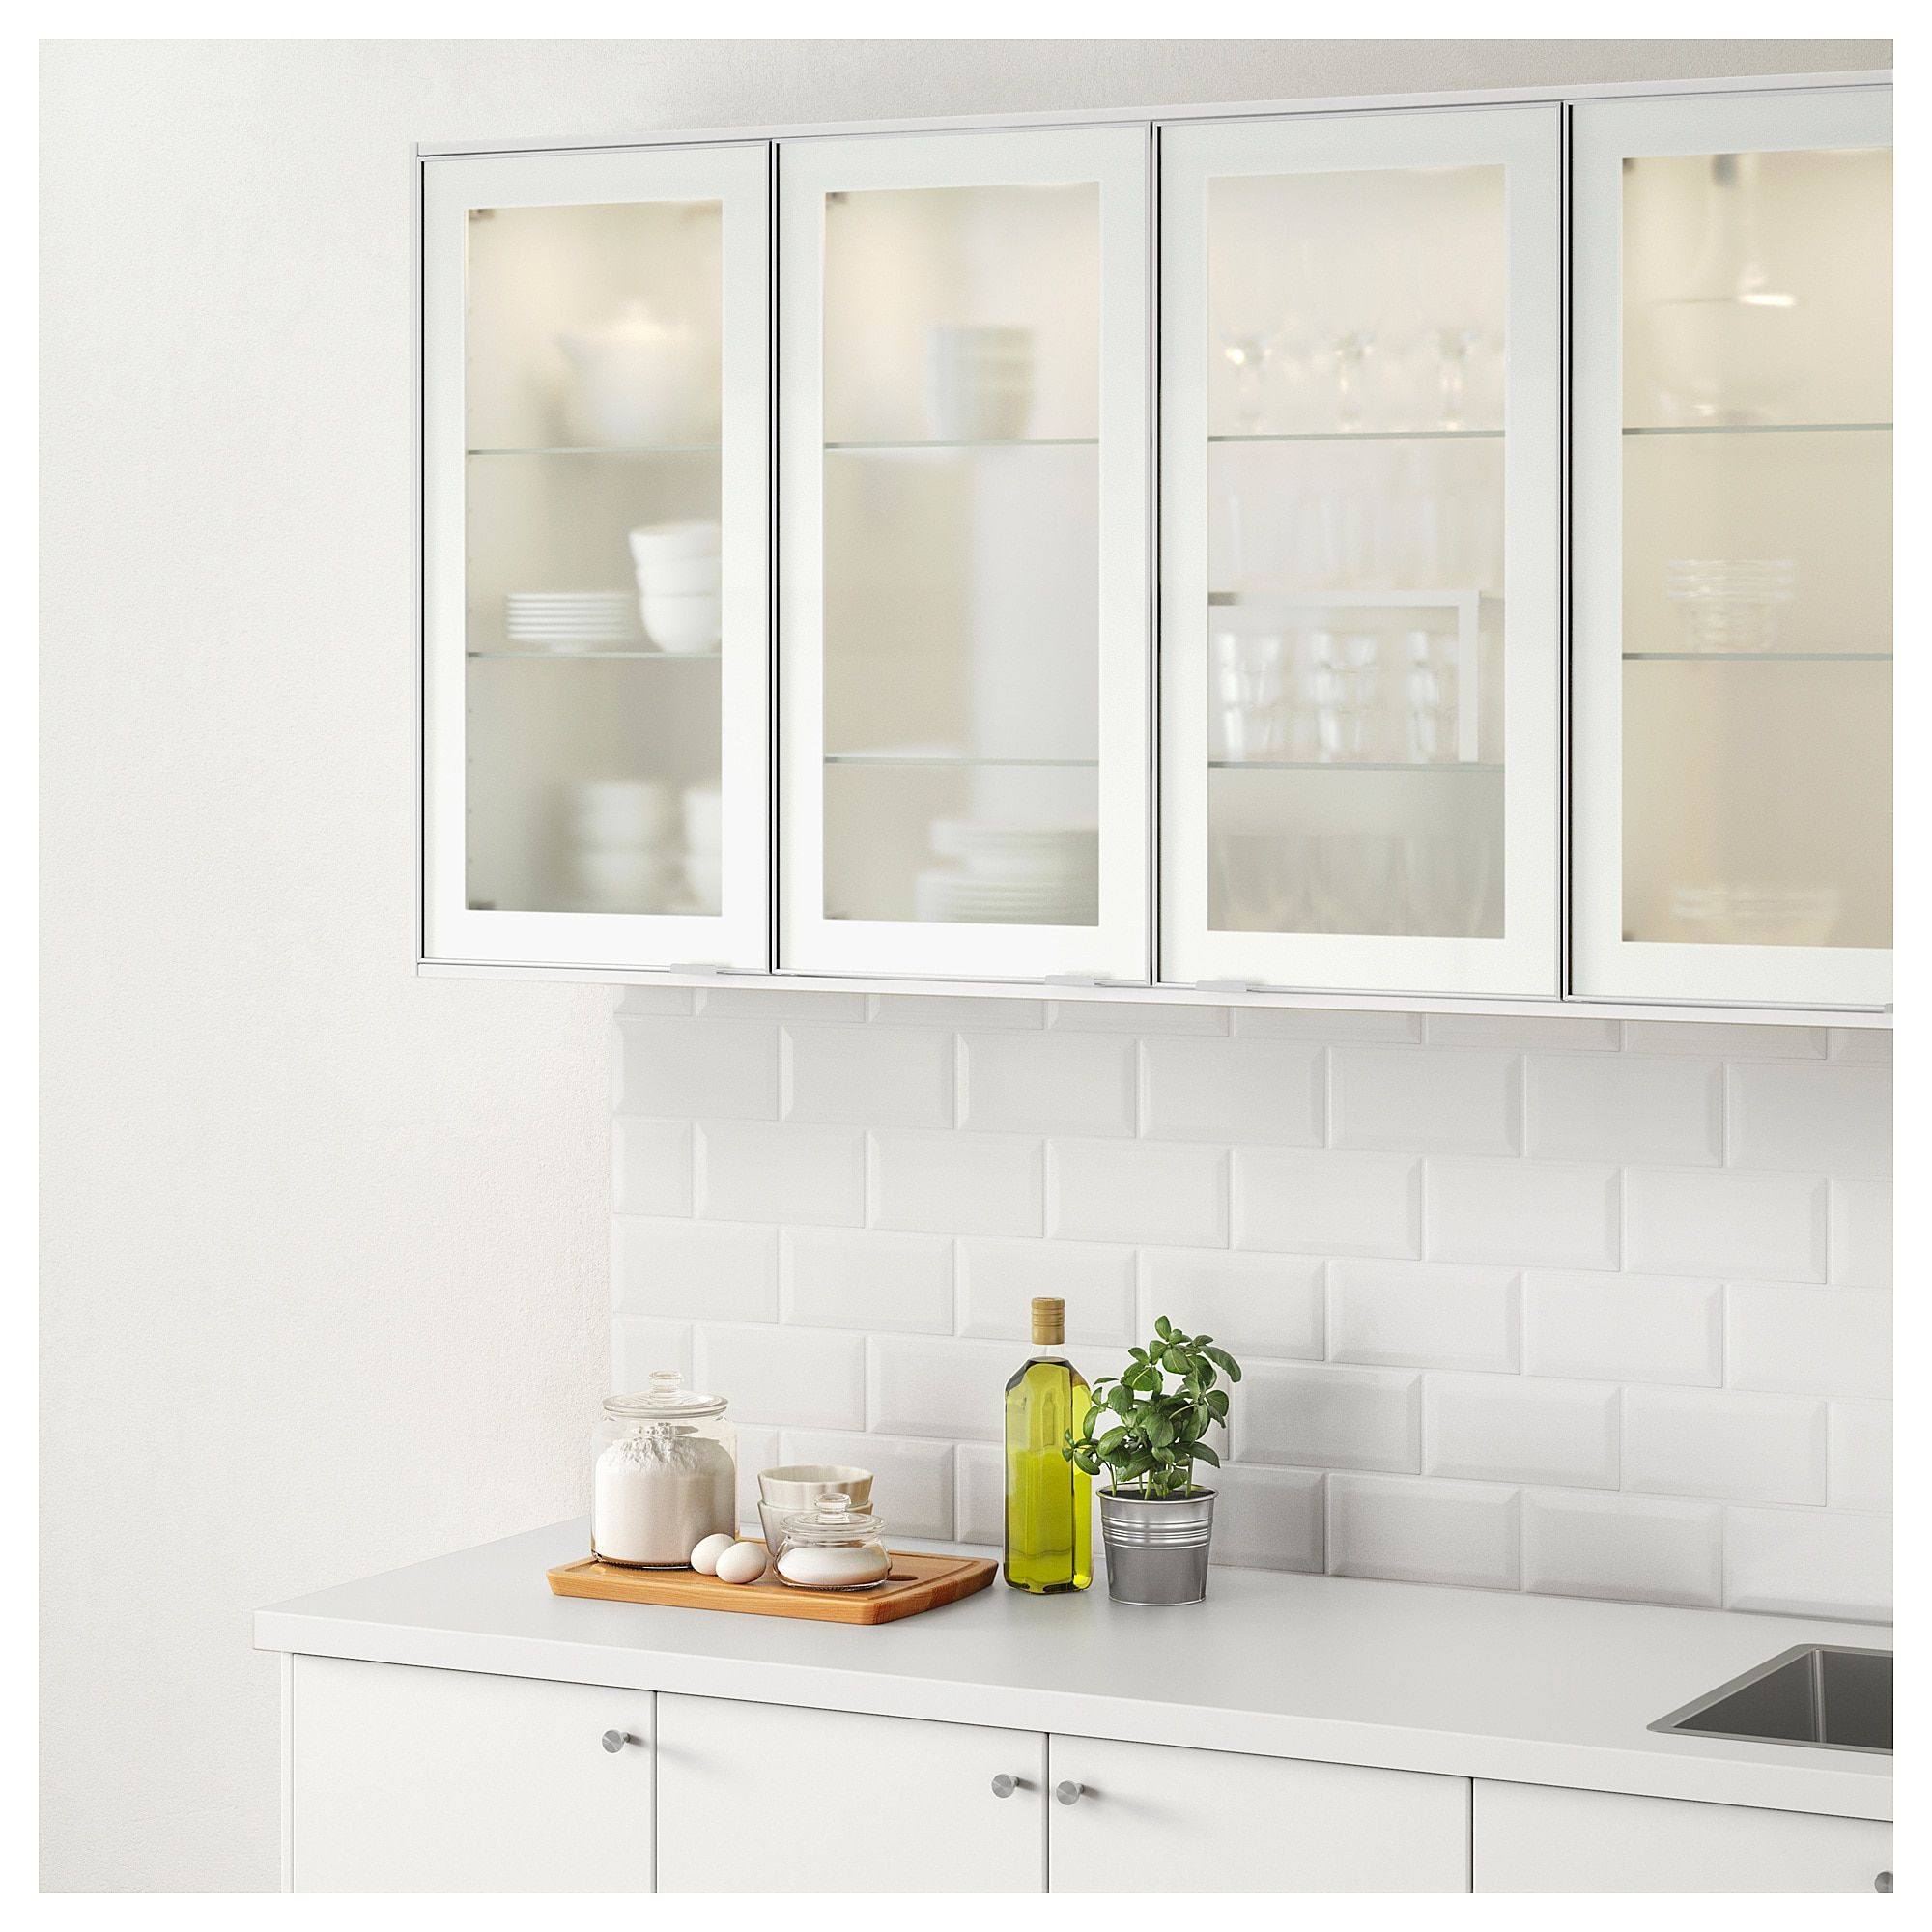 Jutis Glass Door Frosted Glass Aluminum 18x30 Glass Kitchen